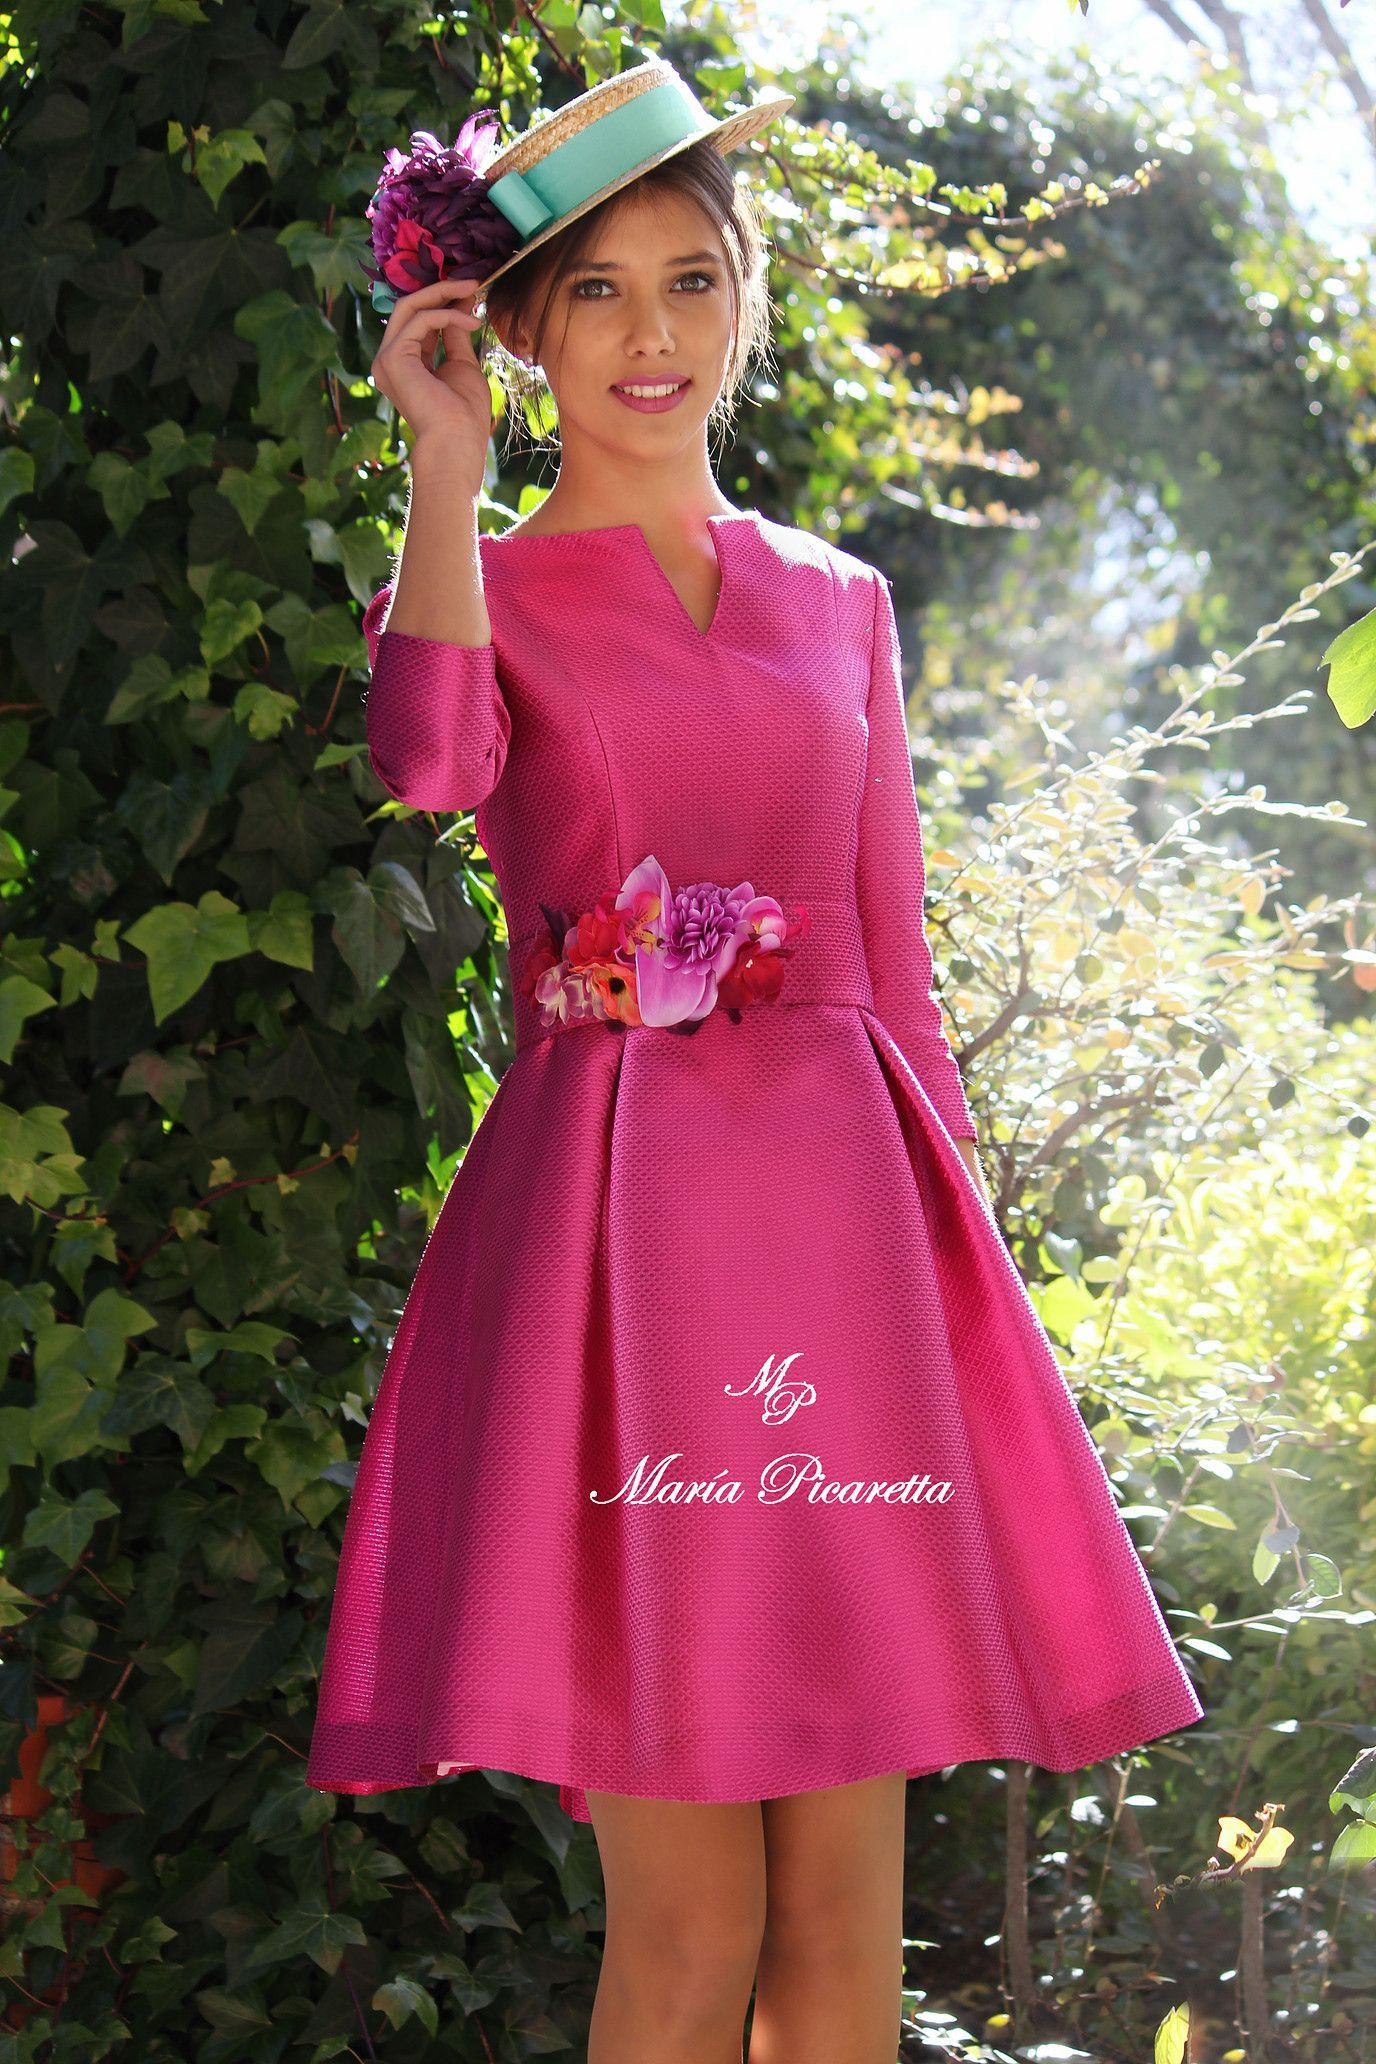 Vestidos de Fiesta de María Picaretta | What to wear | Pinterest ...